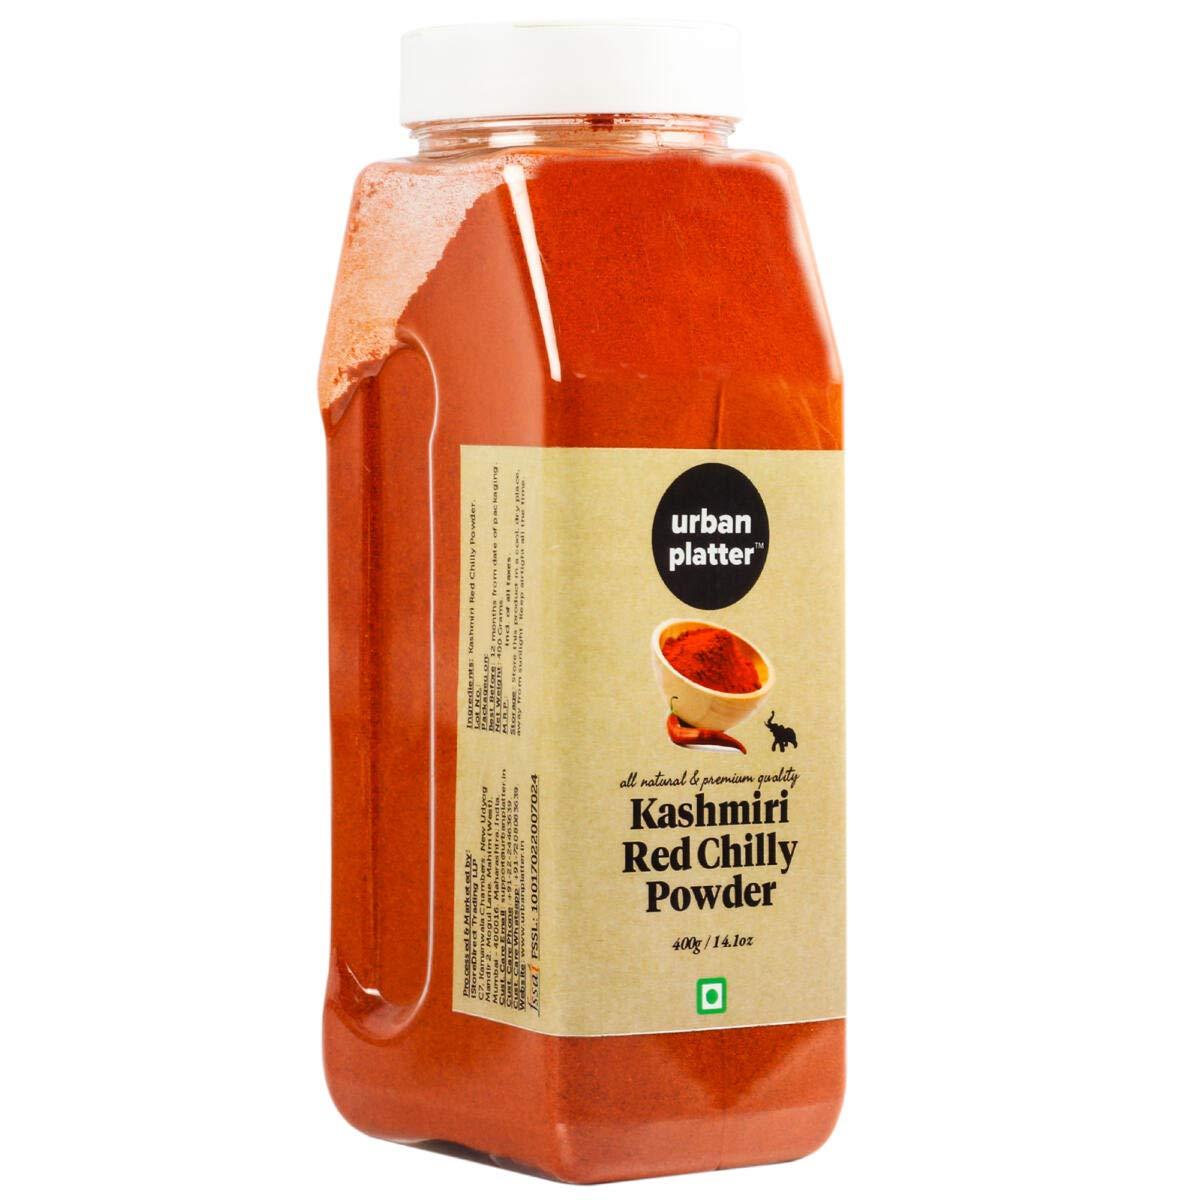 Urban Platter Kashmiri Red Chilly Powder 400g Buy Online In Bahamas At Bahamas Desertcart Com Productid 75826978